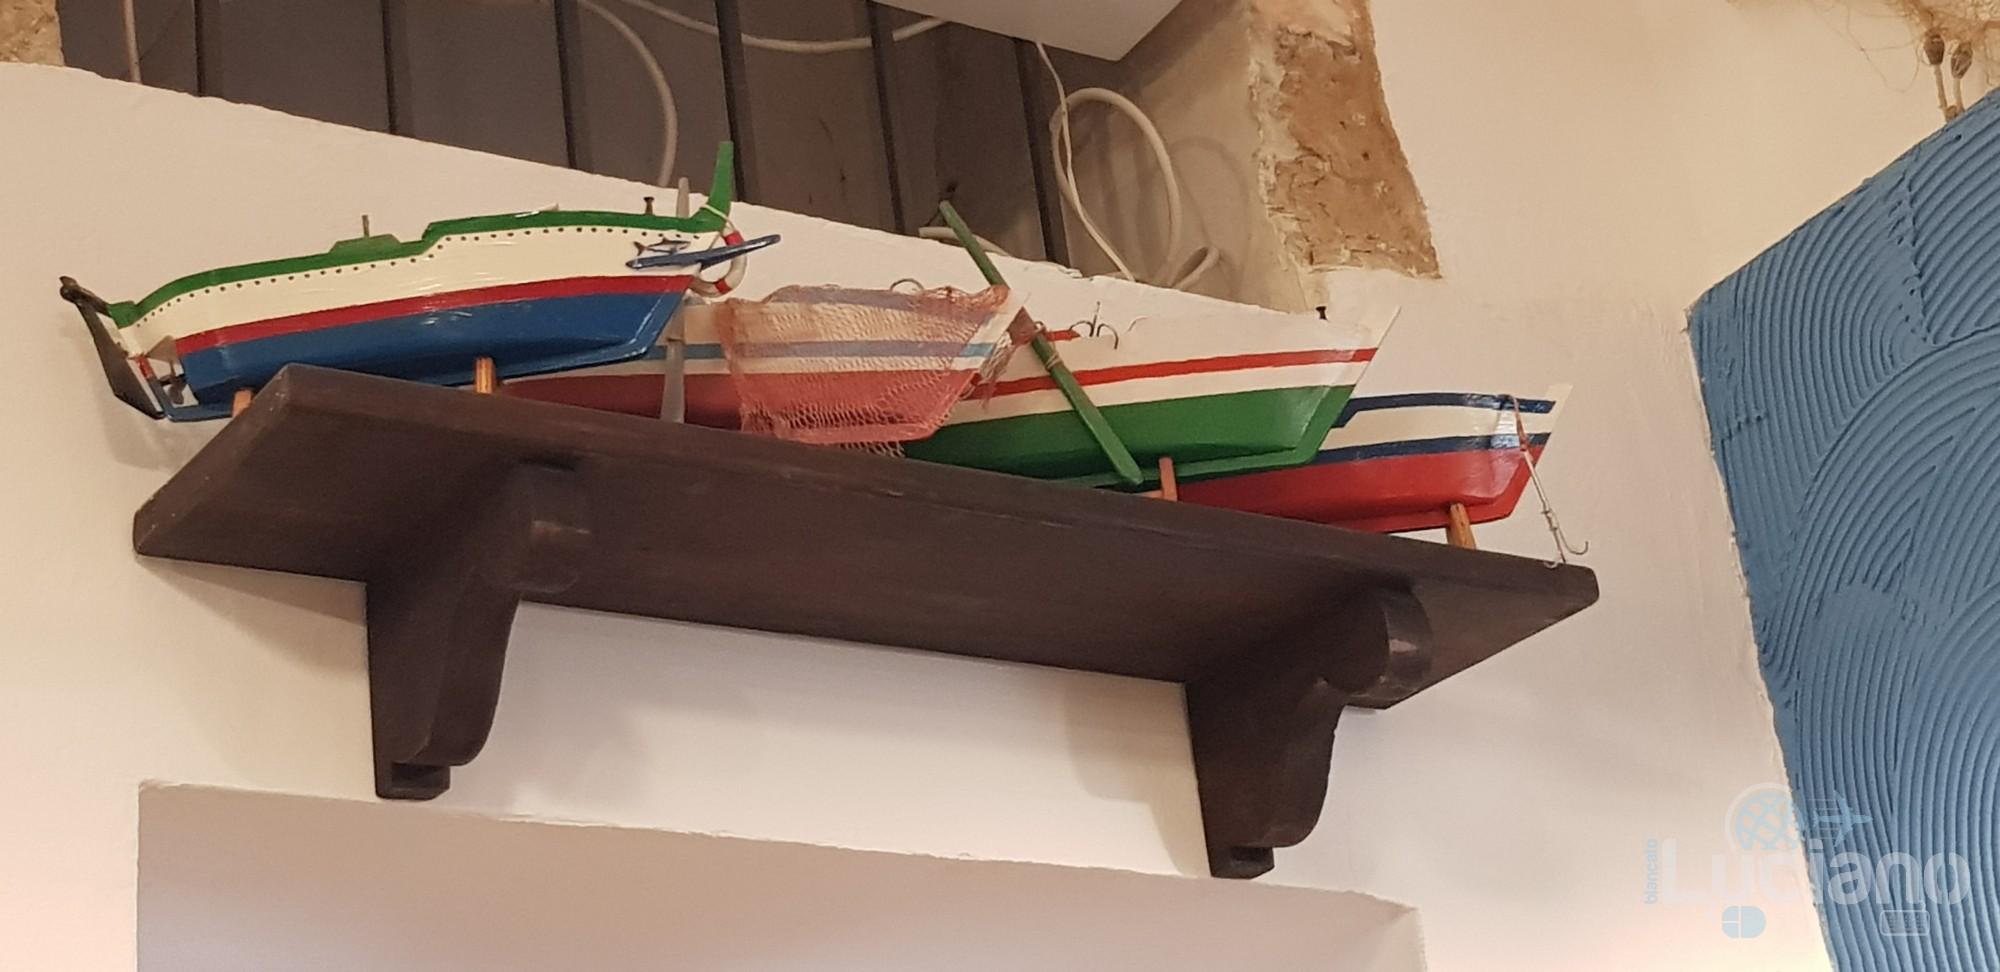 Siracusa - Spizzuliamu - Pasta alla spizzuliamu - modellini barche